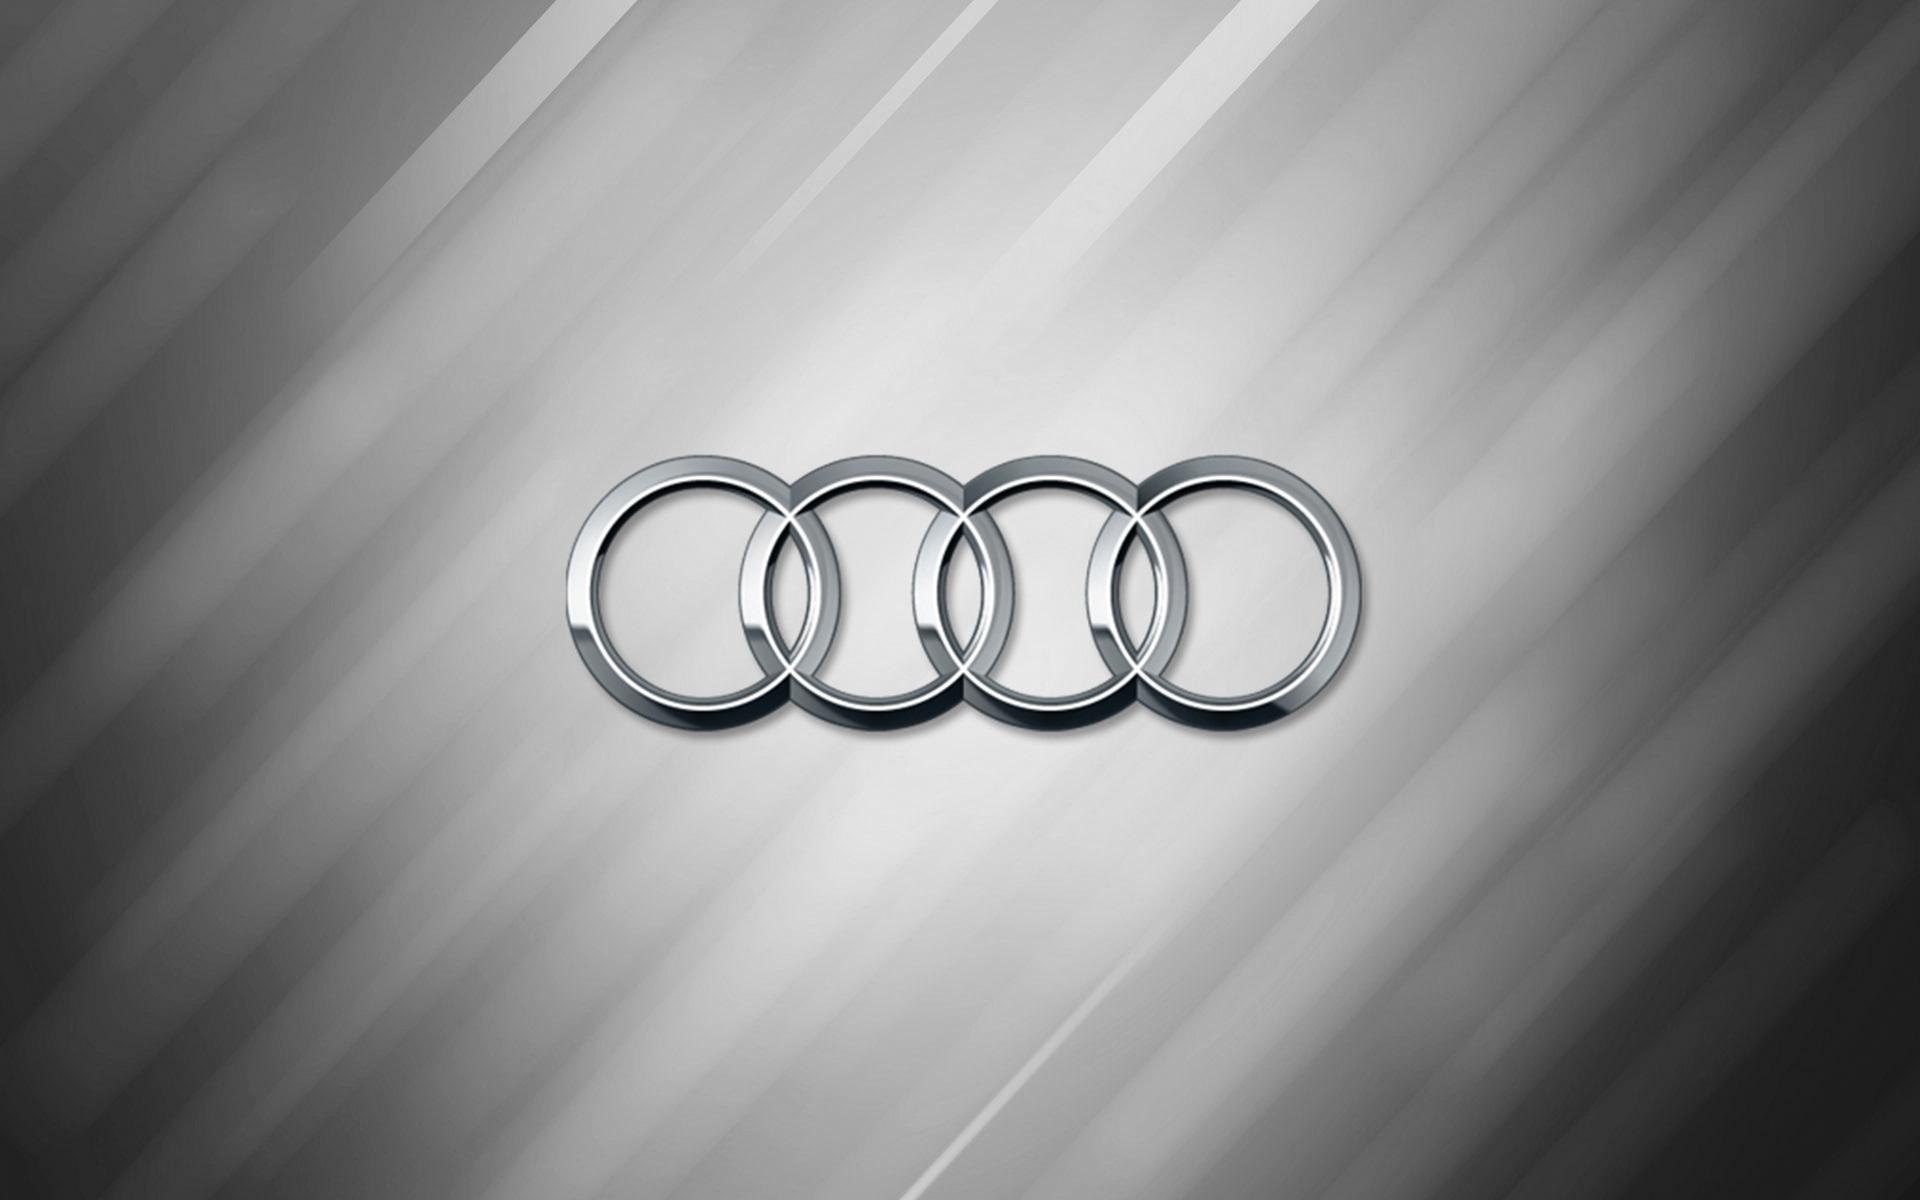 7 HD Audi Logo Wallpapers